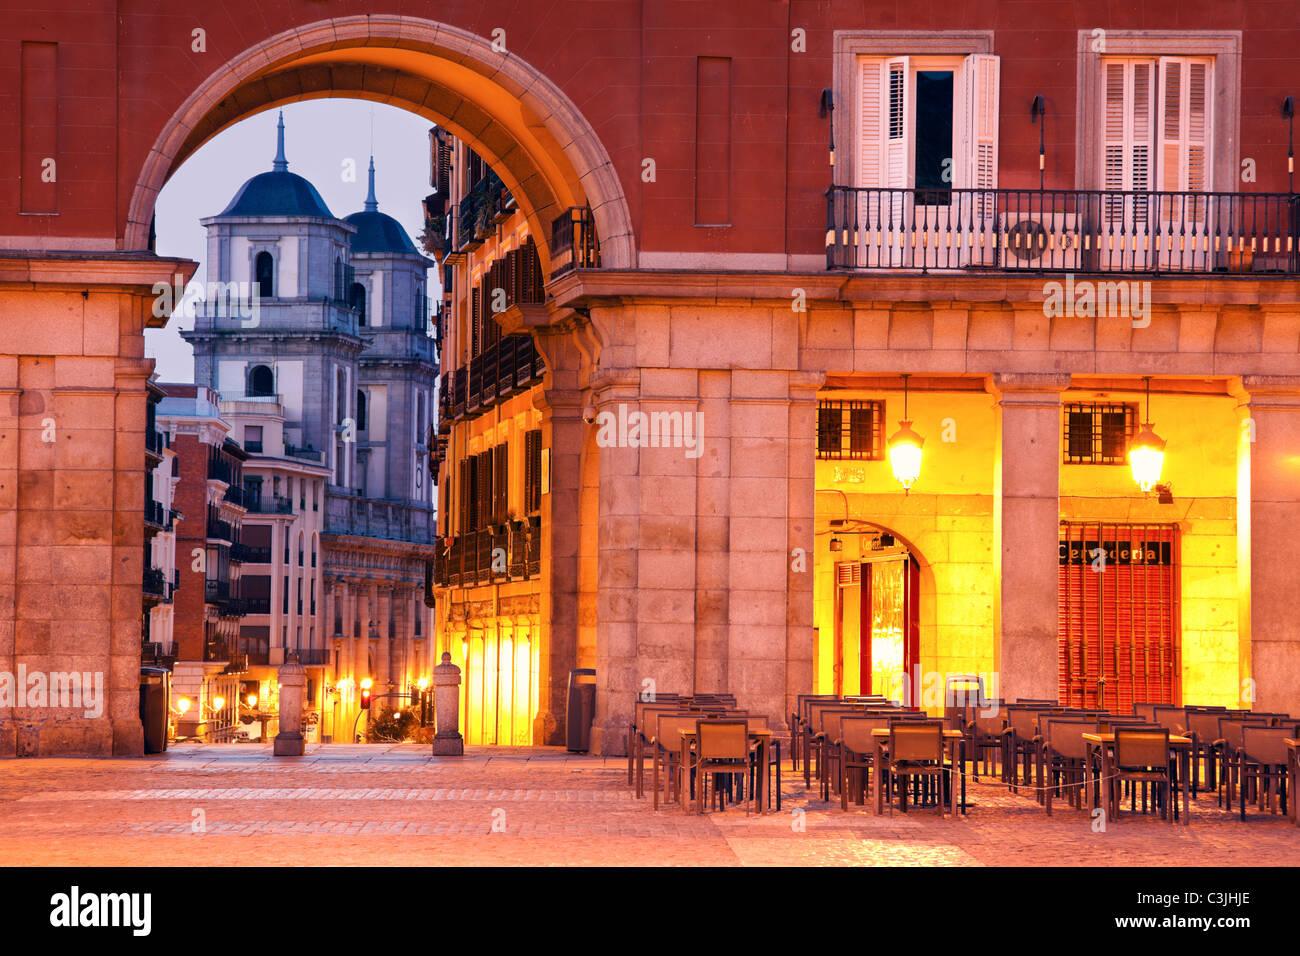 Spain, Madrid, Colegiata de San Isidro - Stock Image